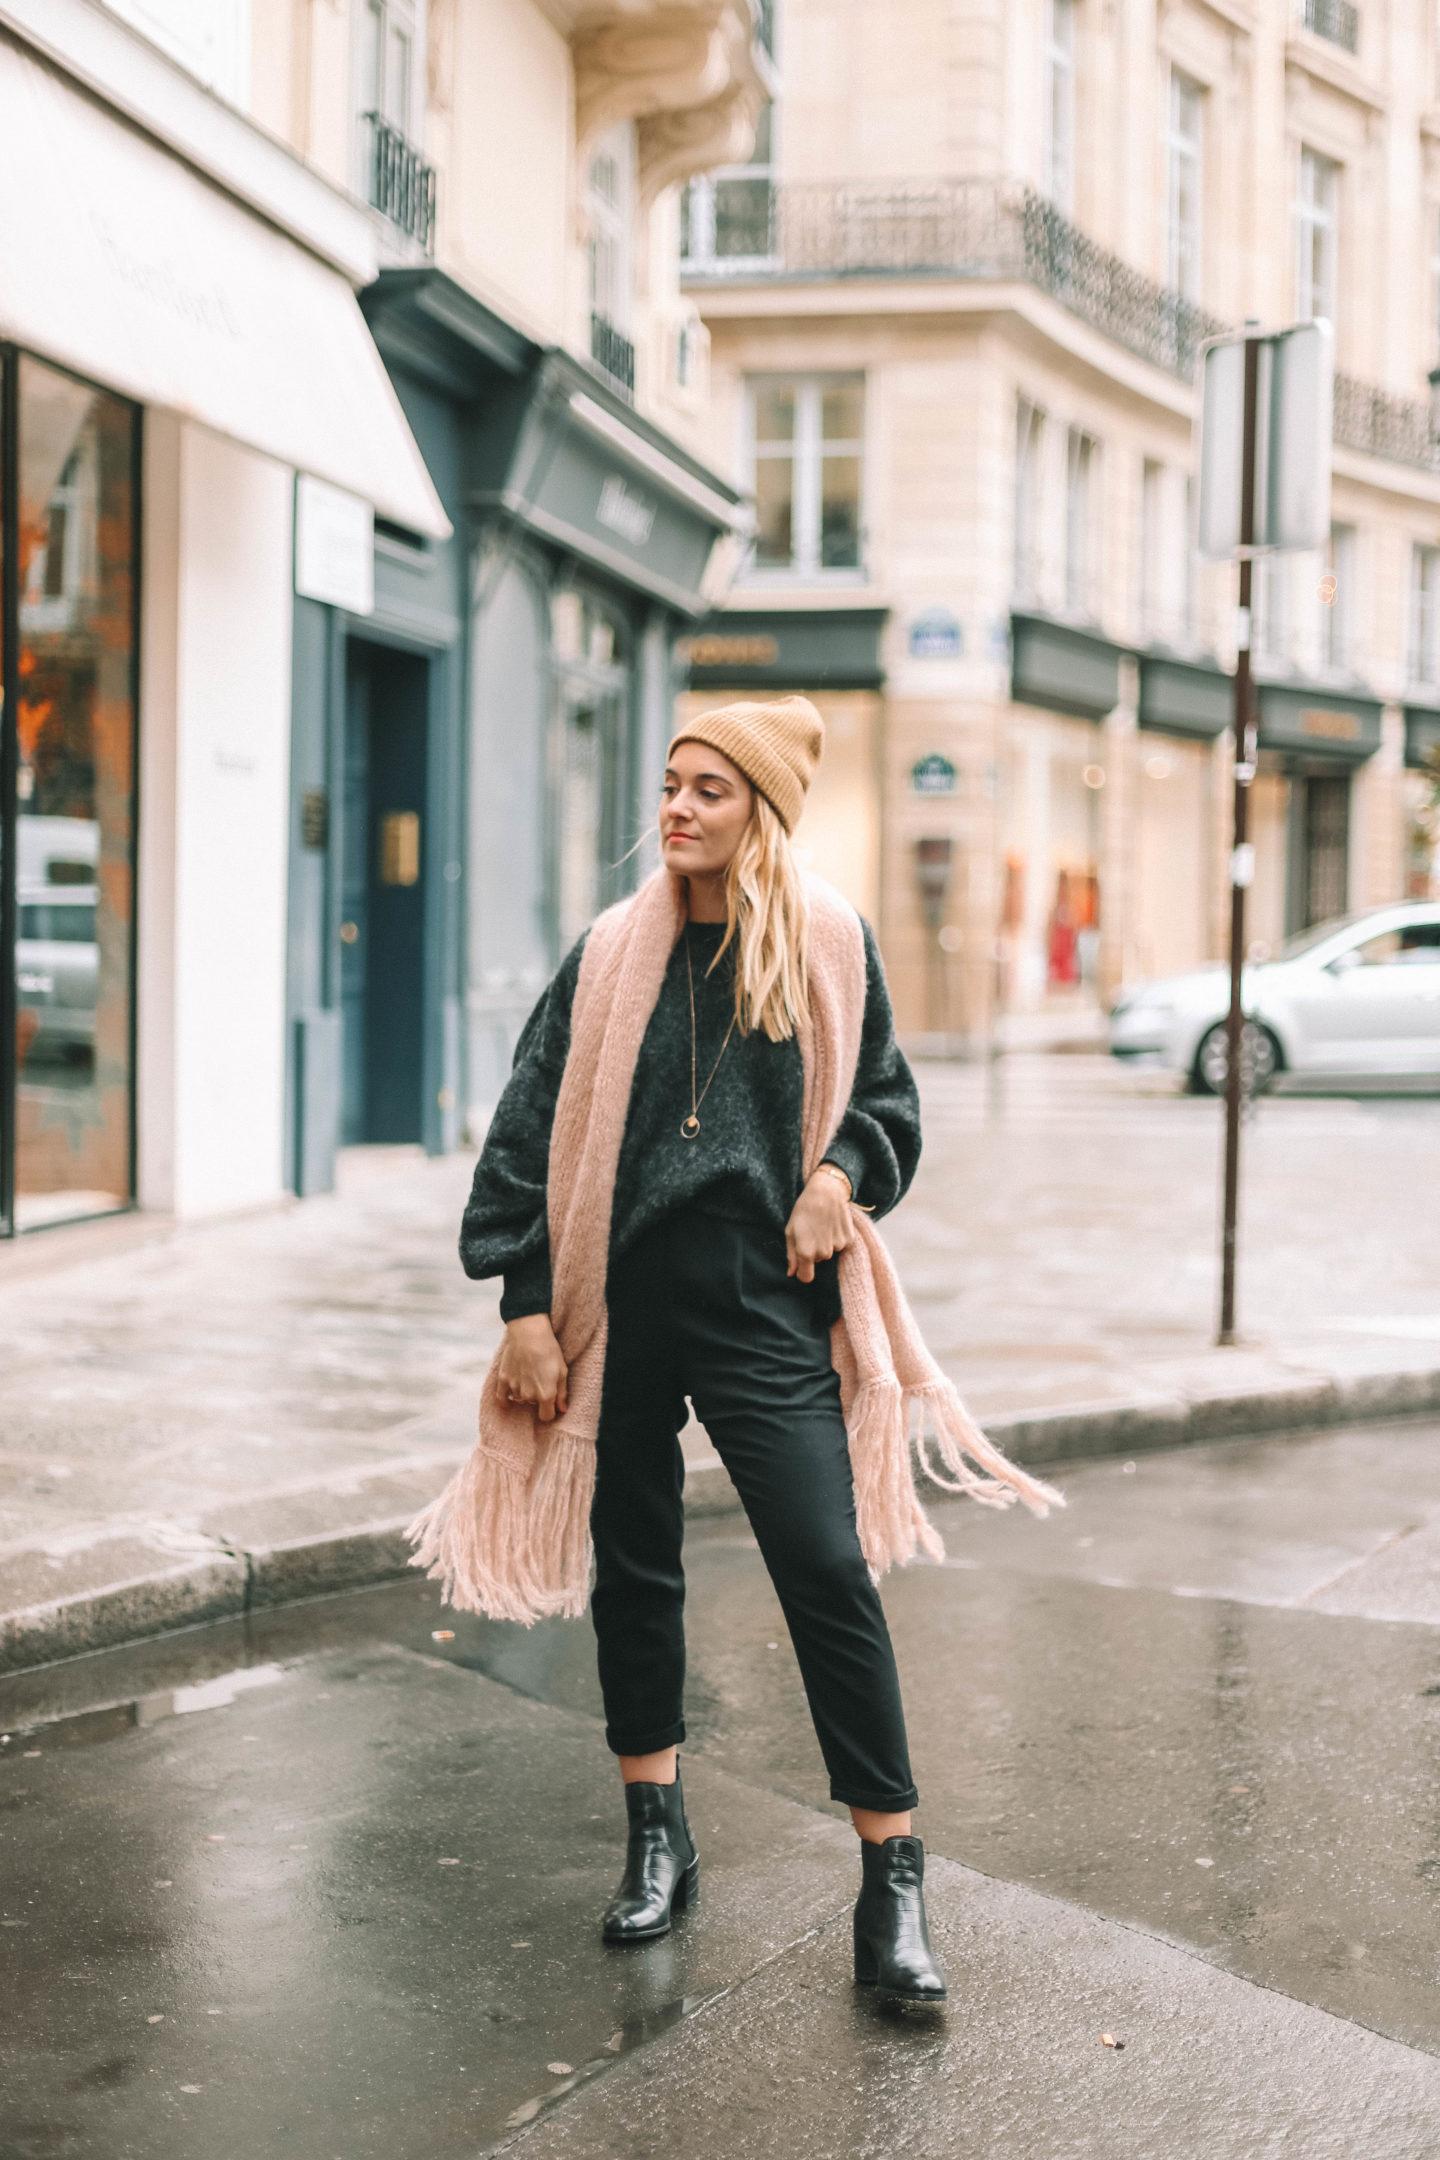 Boots noires Texto - Blondie baby blog mode et voyages